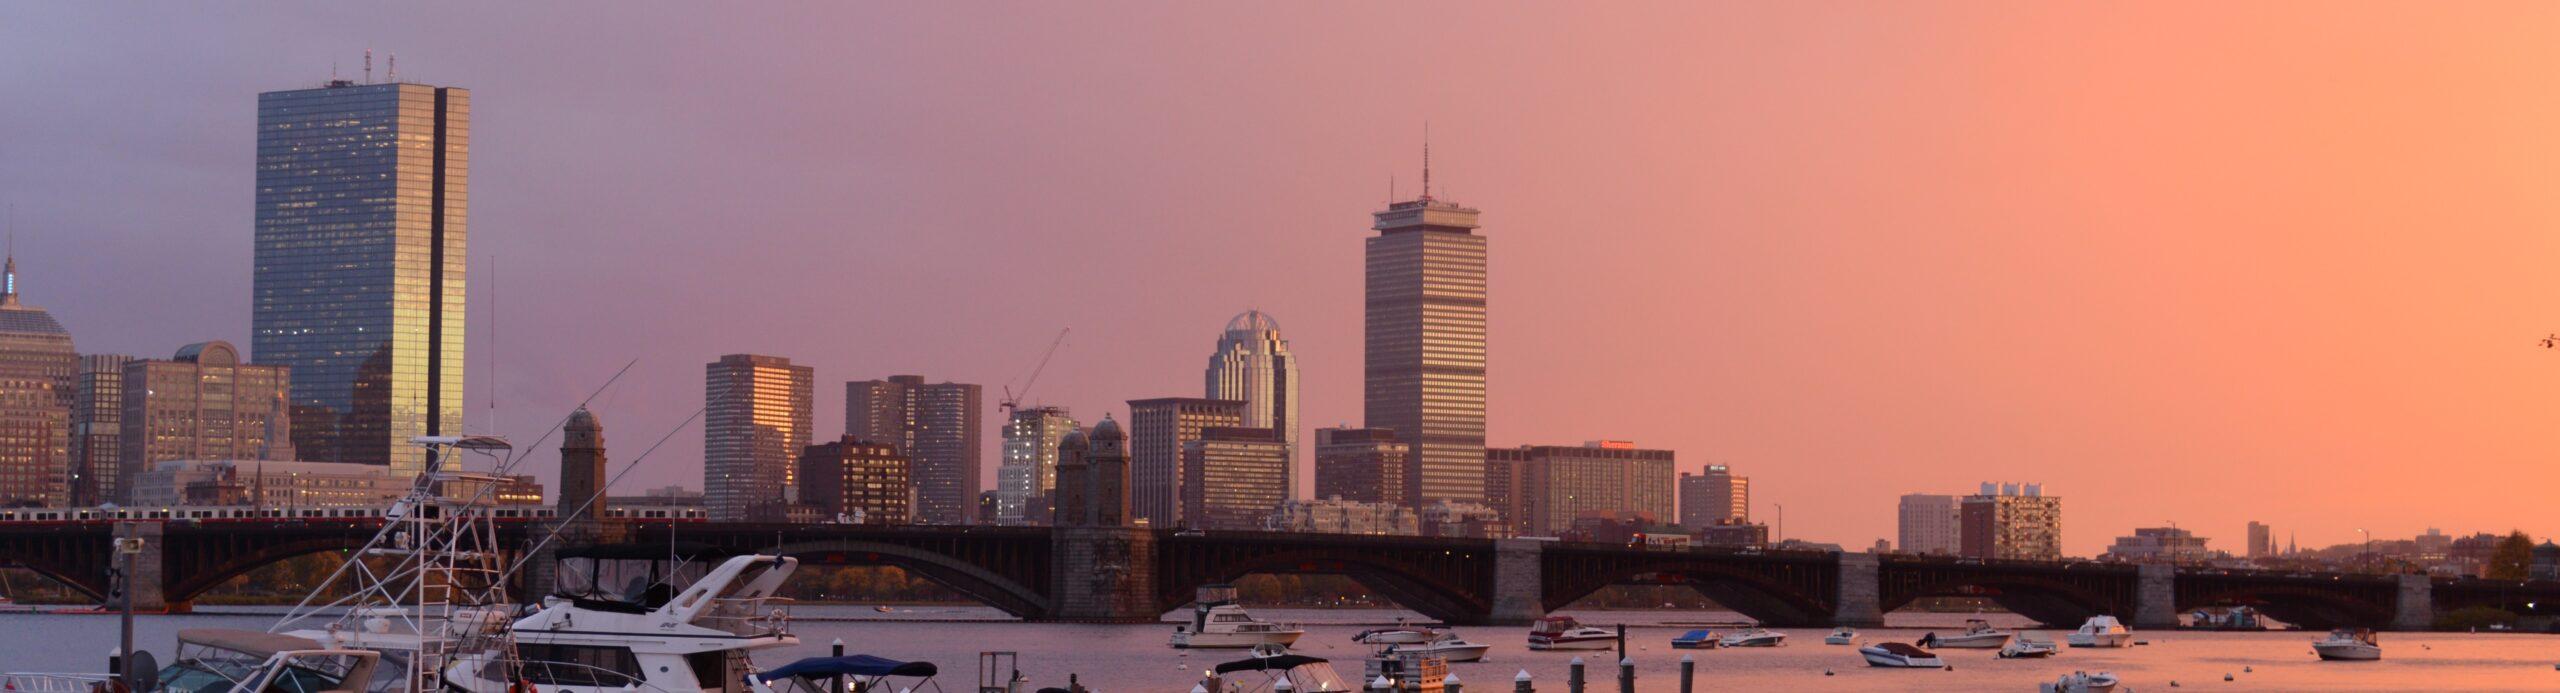 Bostonas, MA